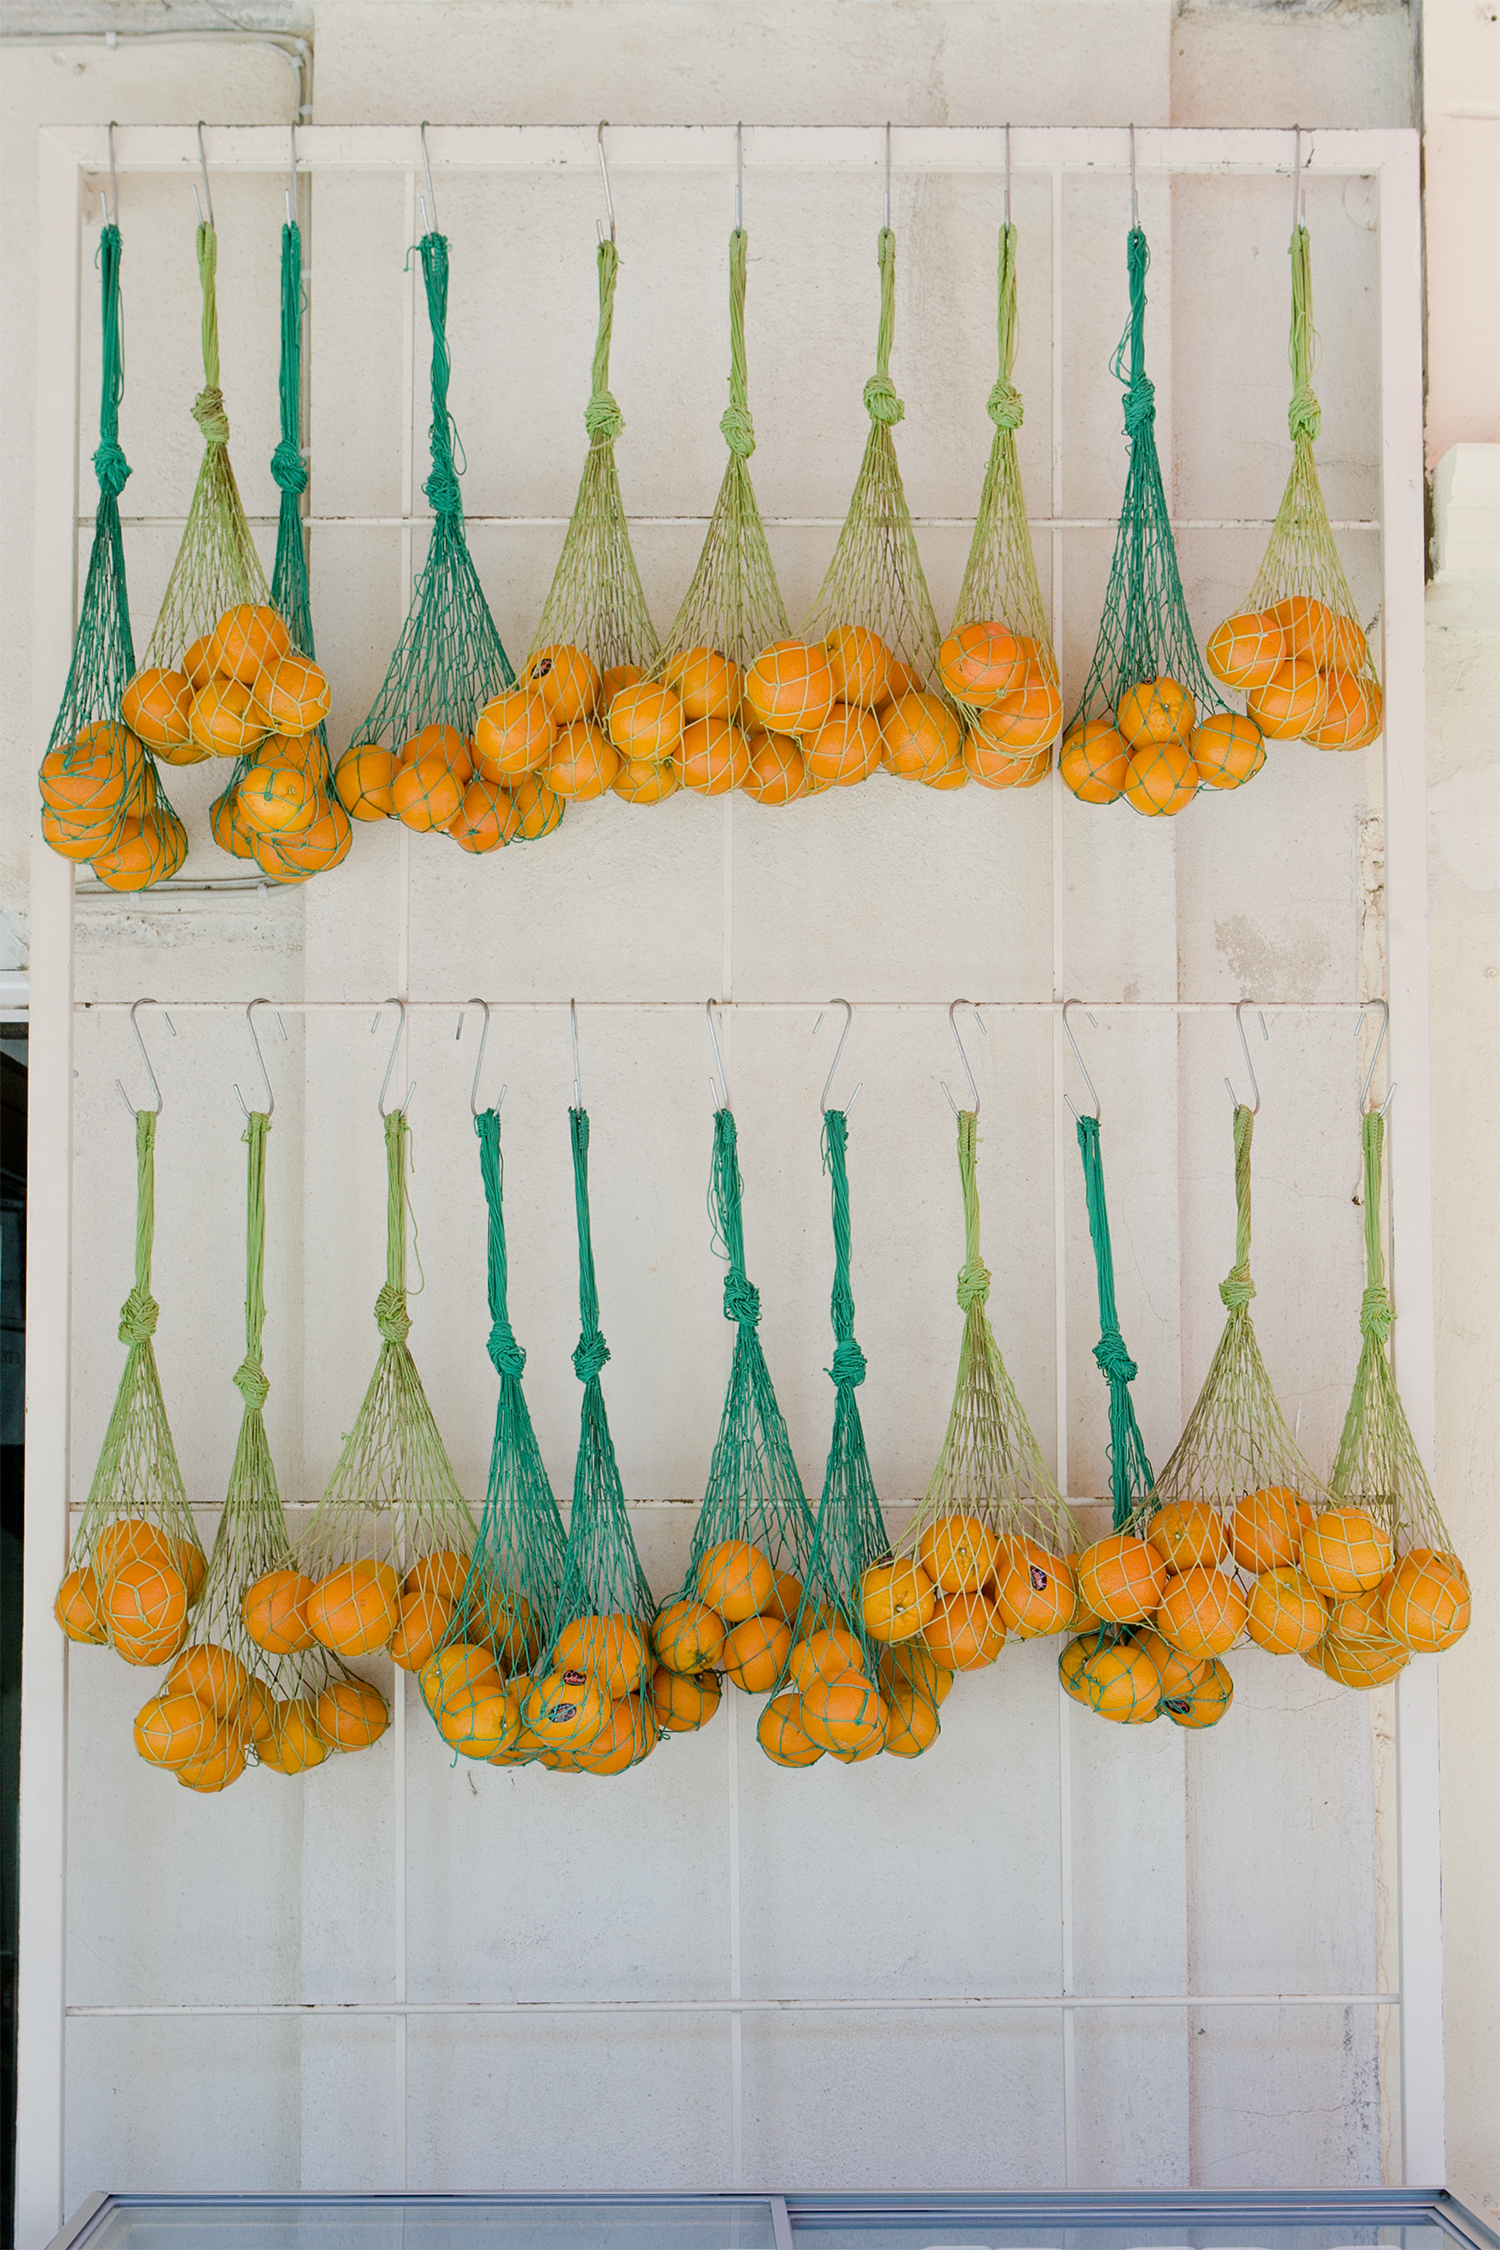 lifestyle-editorial-travel-washington-dc-malek-naz-photography-oranges-turkey.jpg